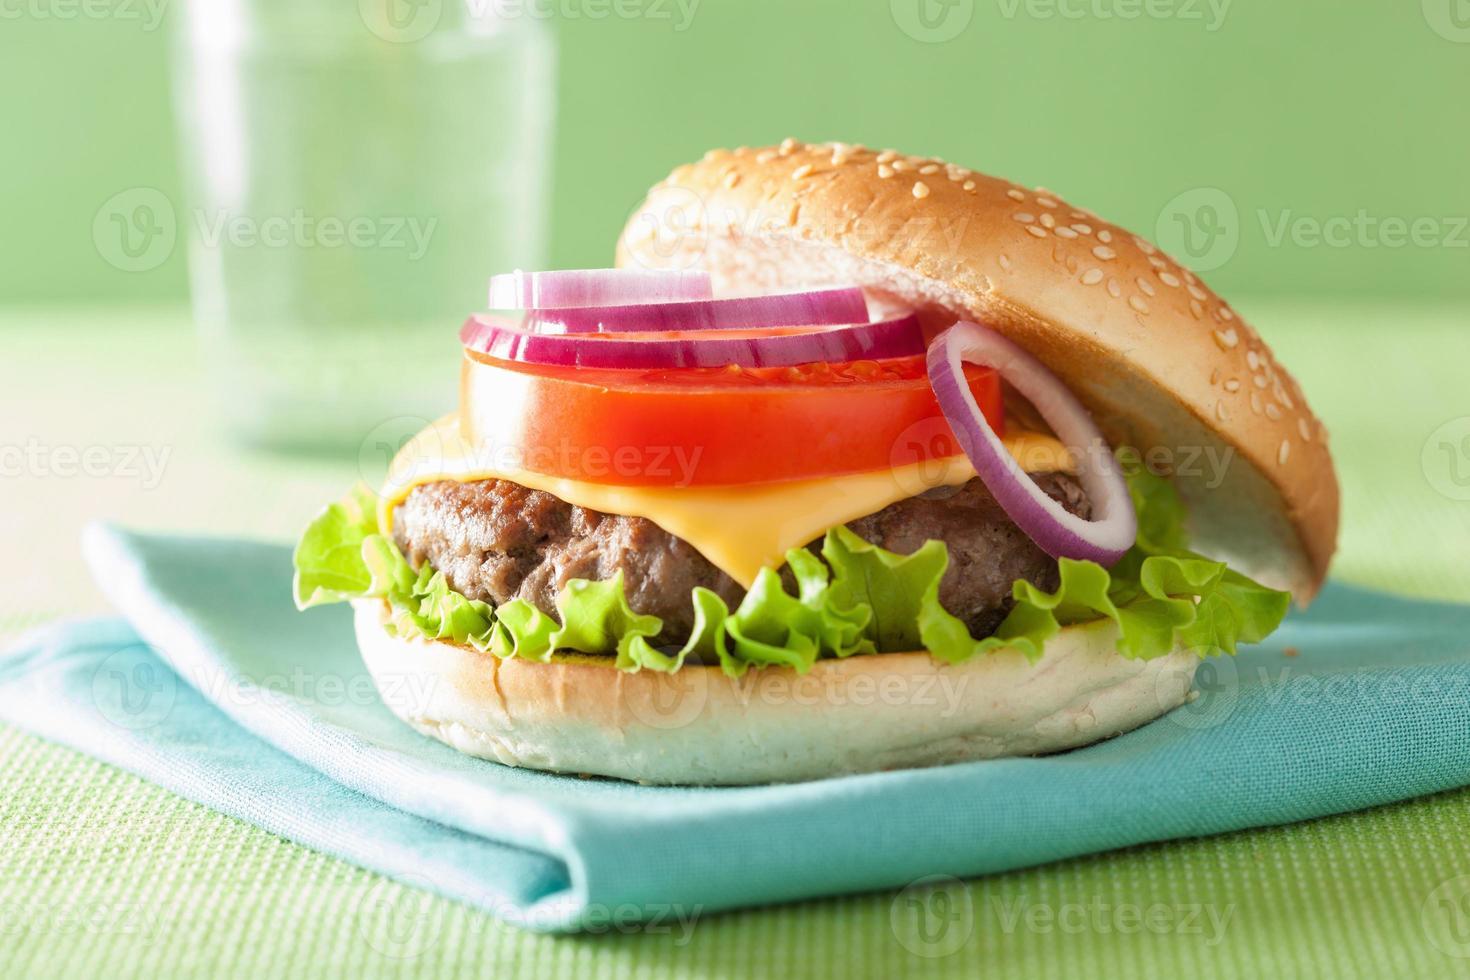 cheeseburger avec boeuf galette de fromage laitue oignon tomate photo